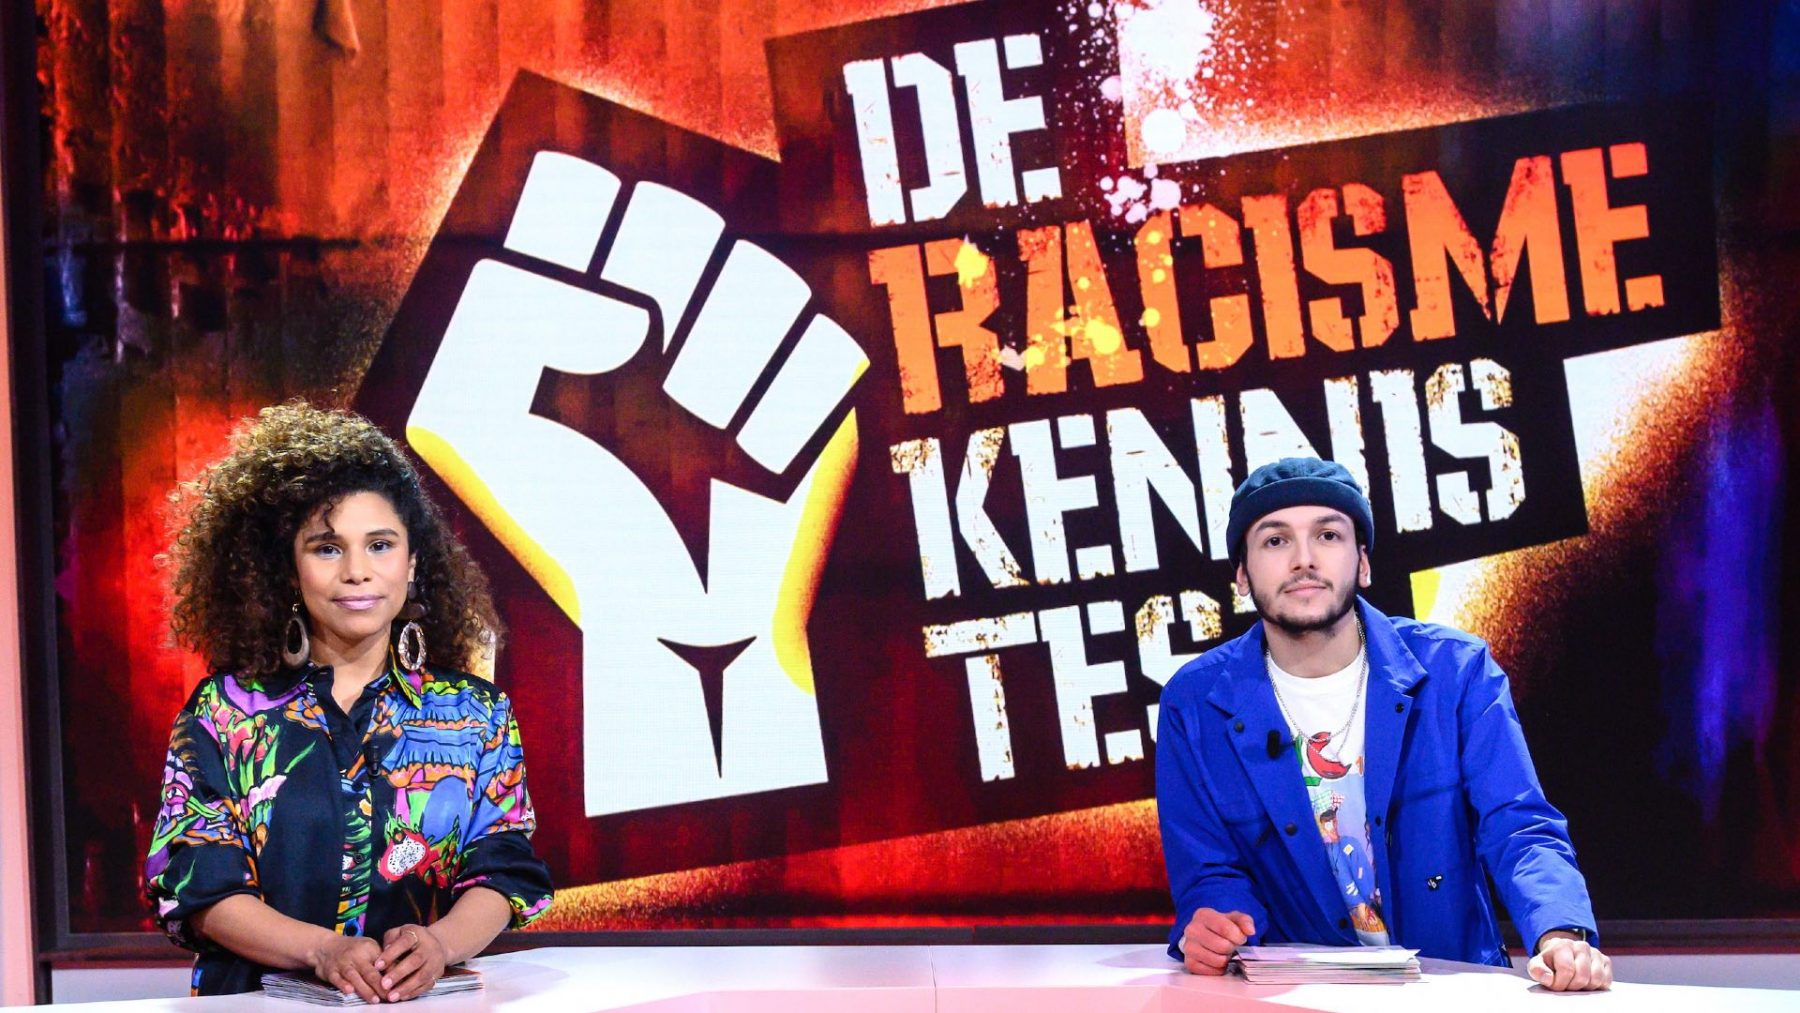 Olcay Gulsen en Peter R. de Vries doen zondag 'De Racisme Kennistest': 'Ontzettend nodig'